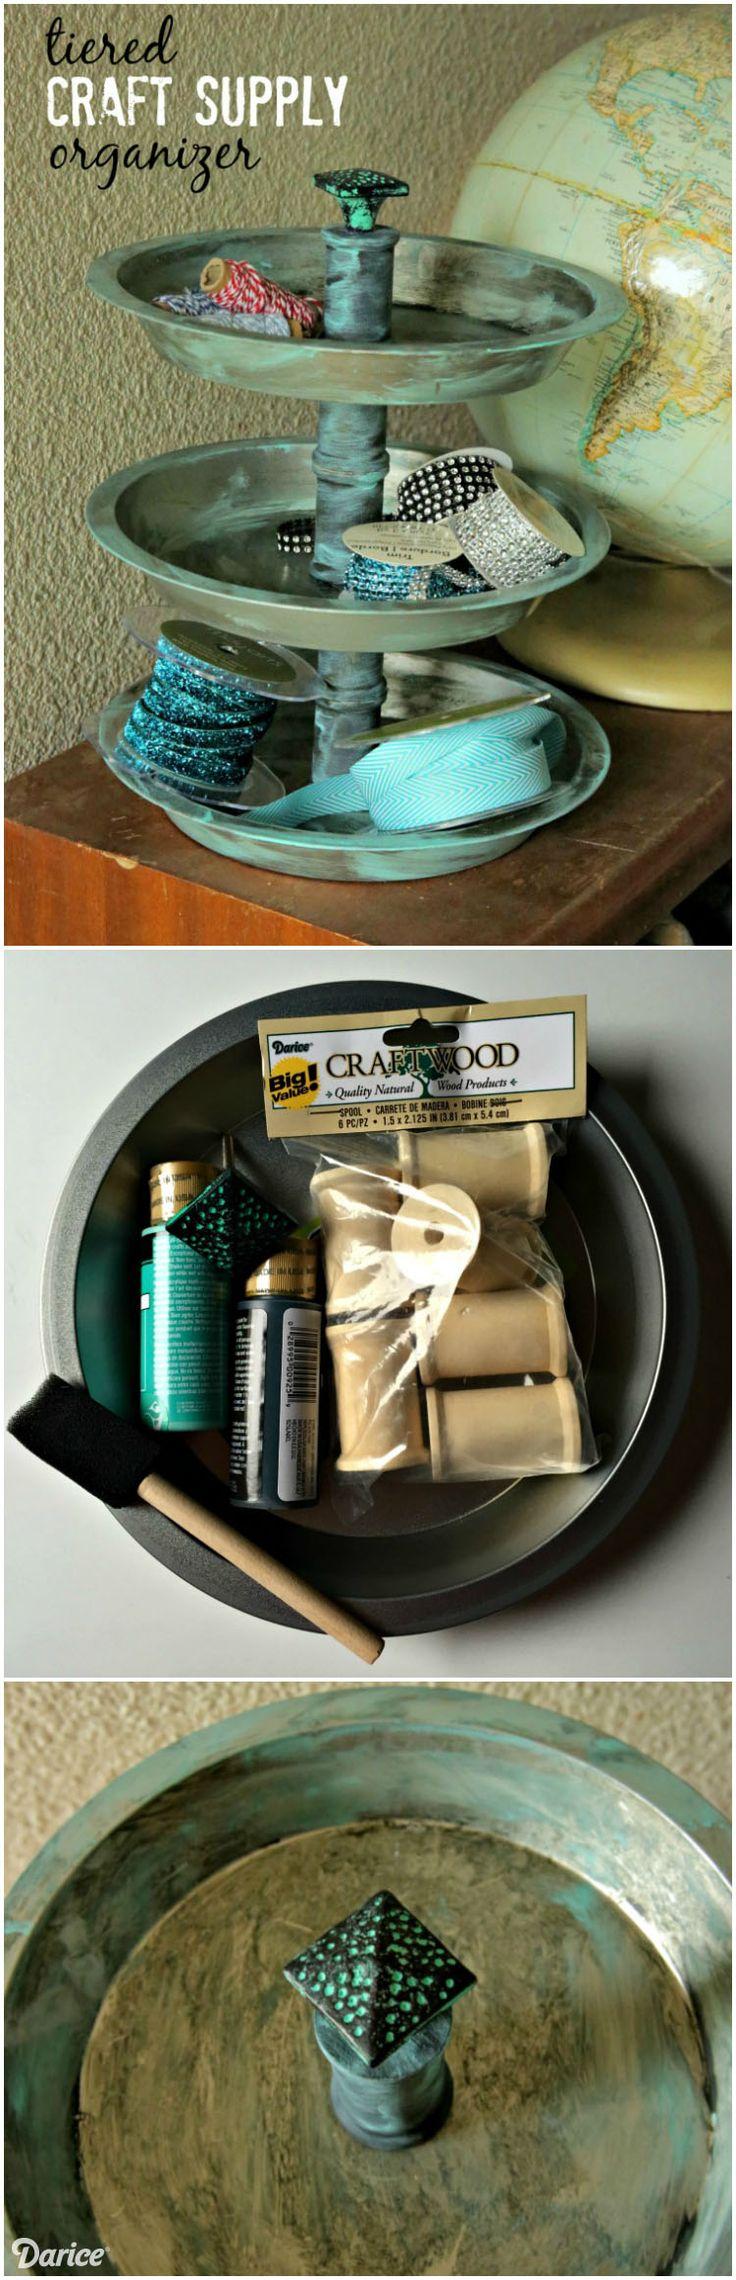 DIY Organizer for Craft Supplies – Darice